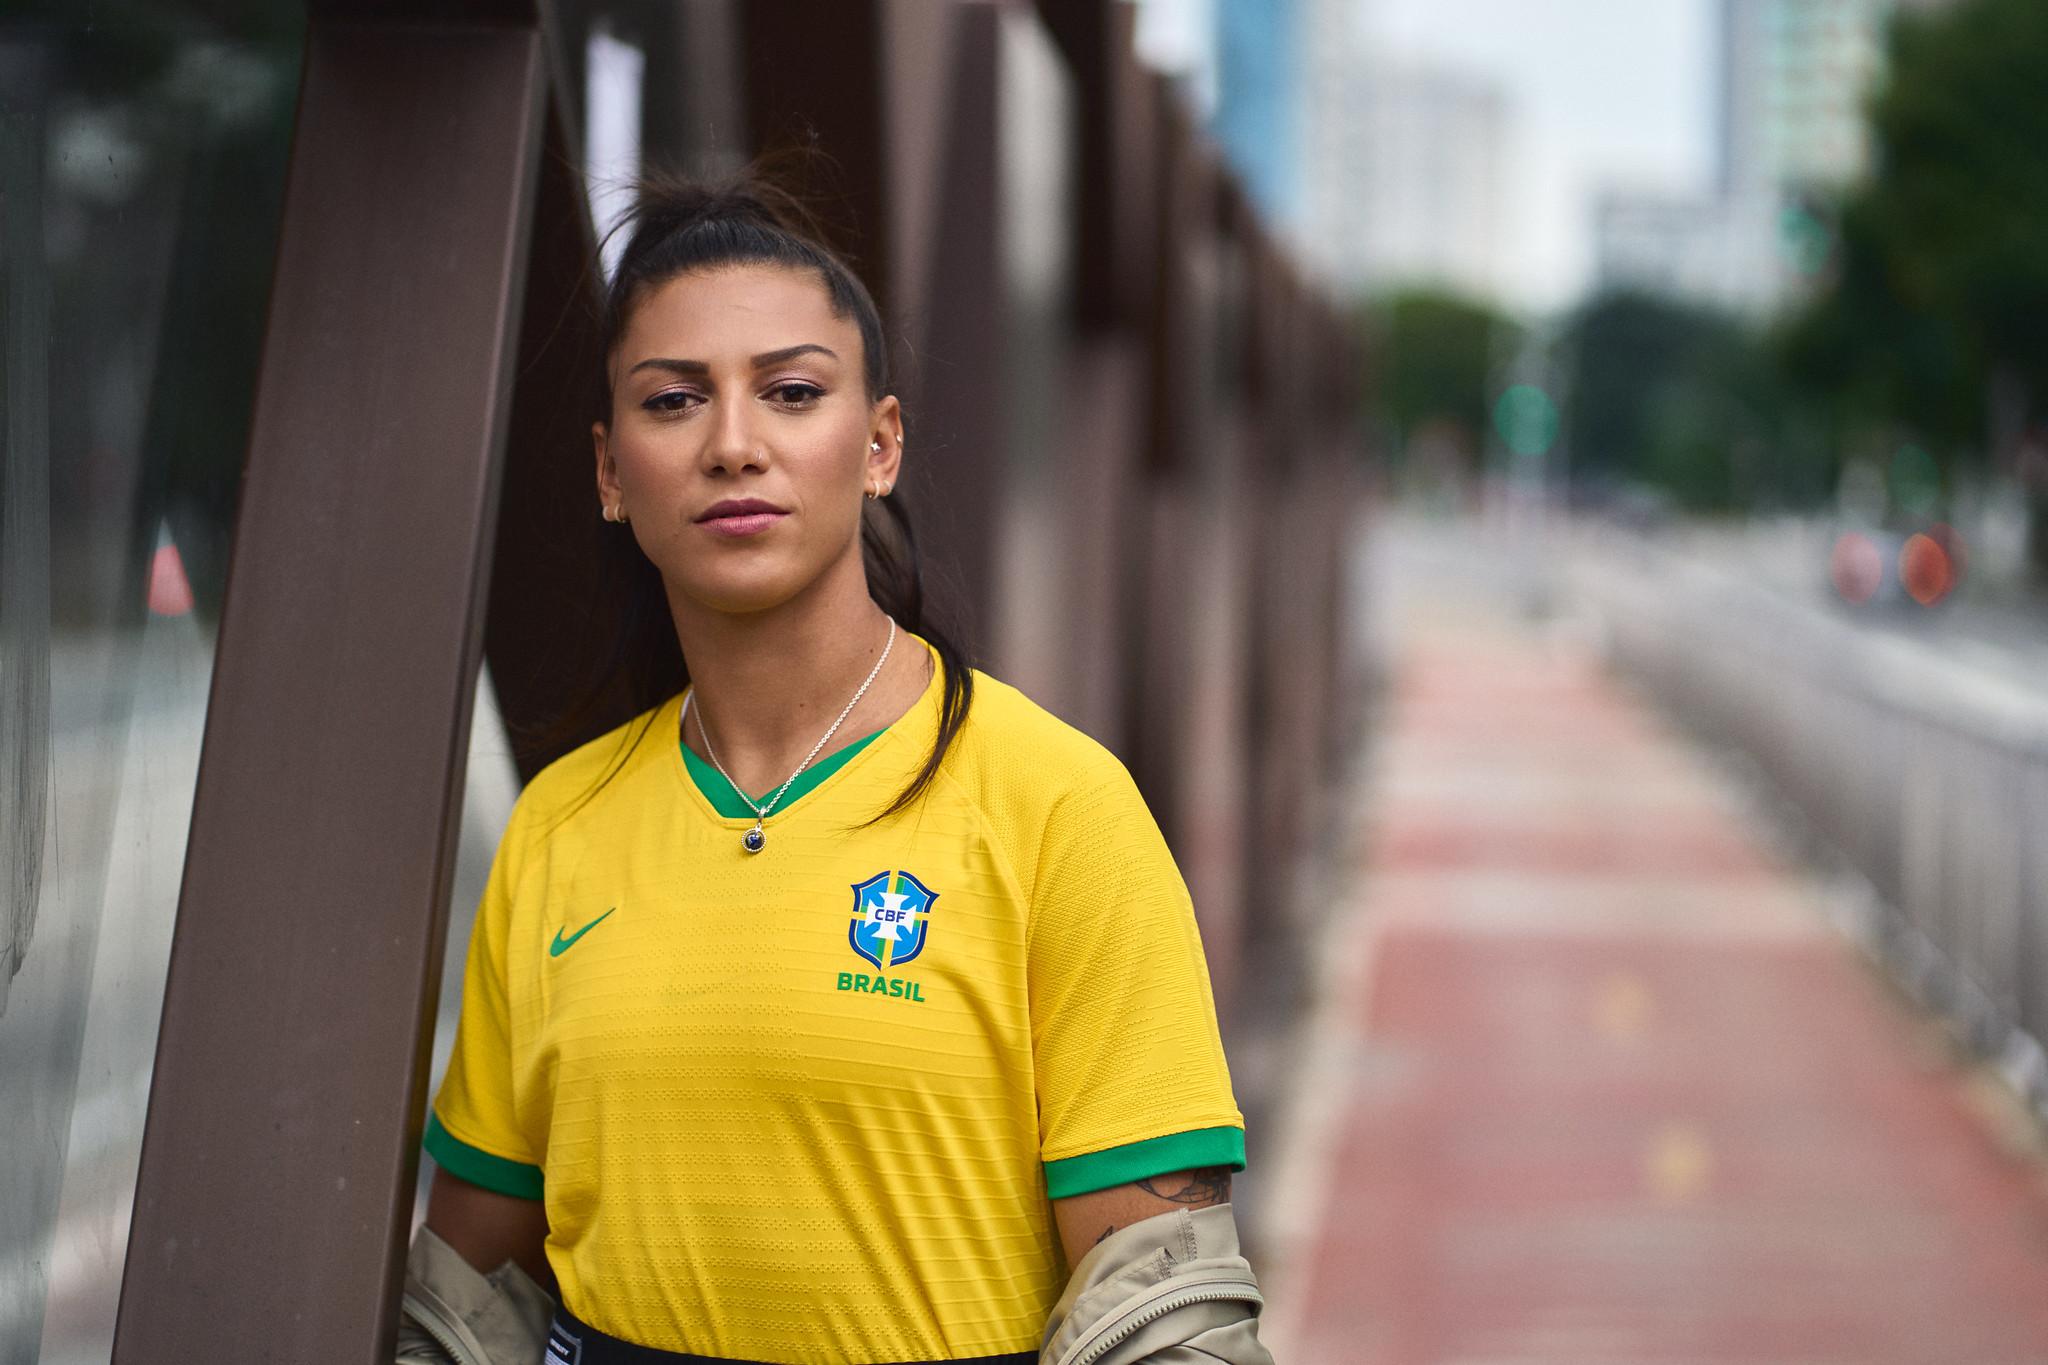 Seleção Brasileira Feminina apresenta uniforme exclusivo - Olimpia Sports